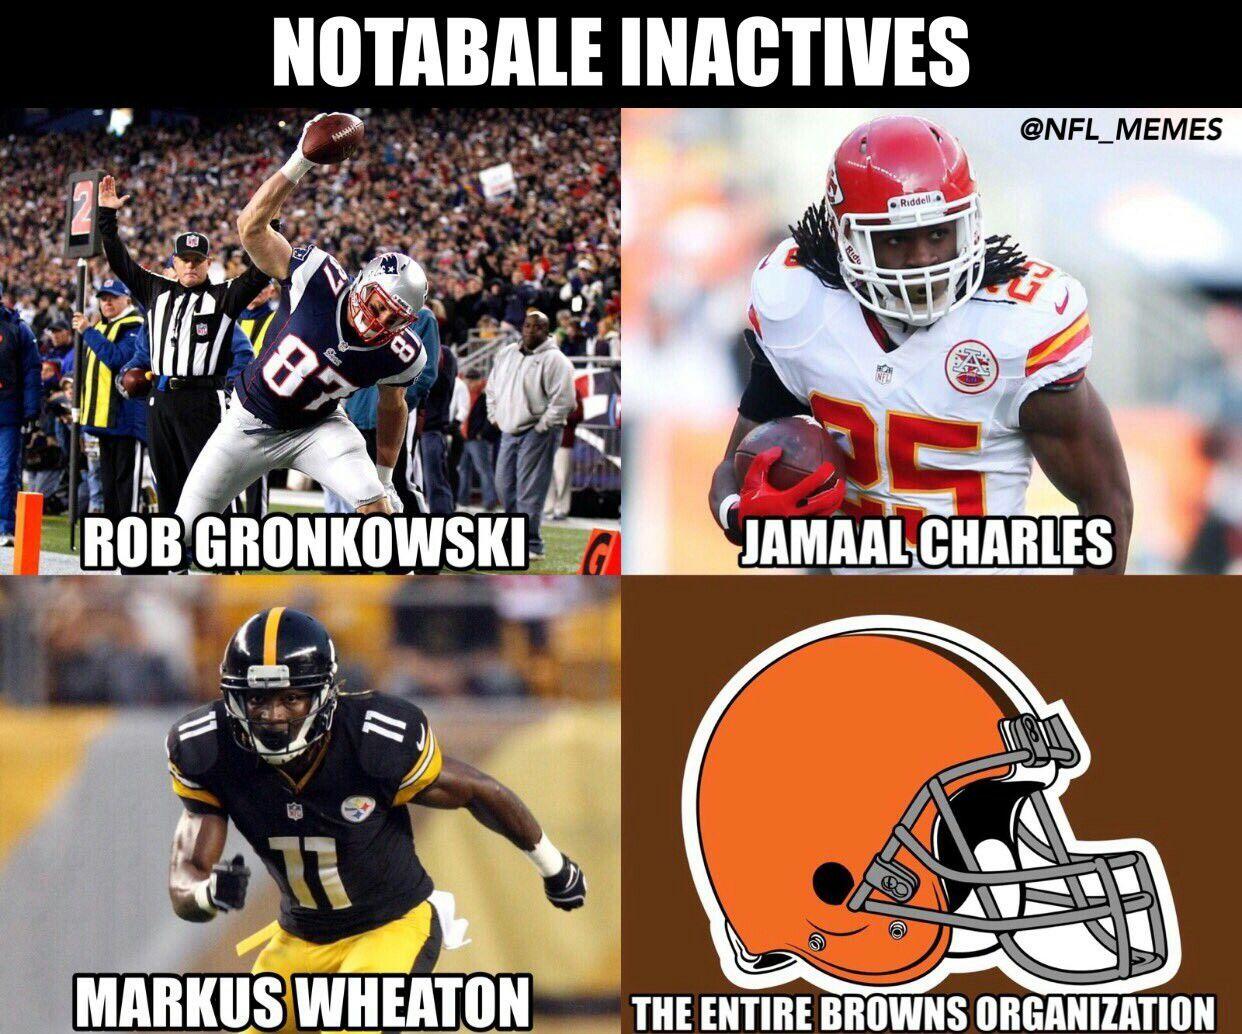 2016 Week 2 Nfl Memes Football Memes Sports Memes